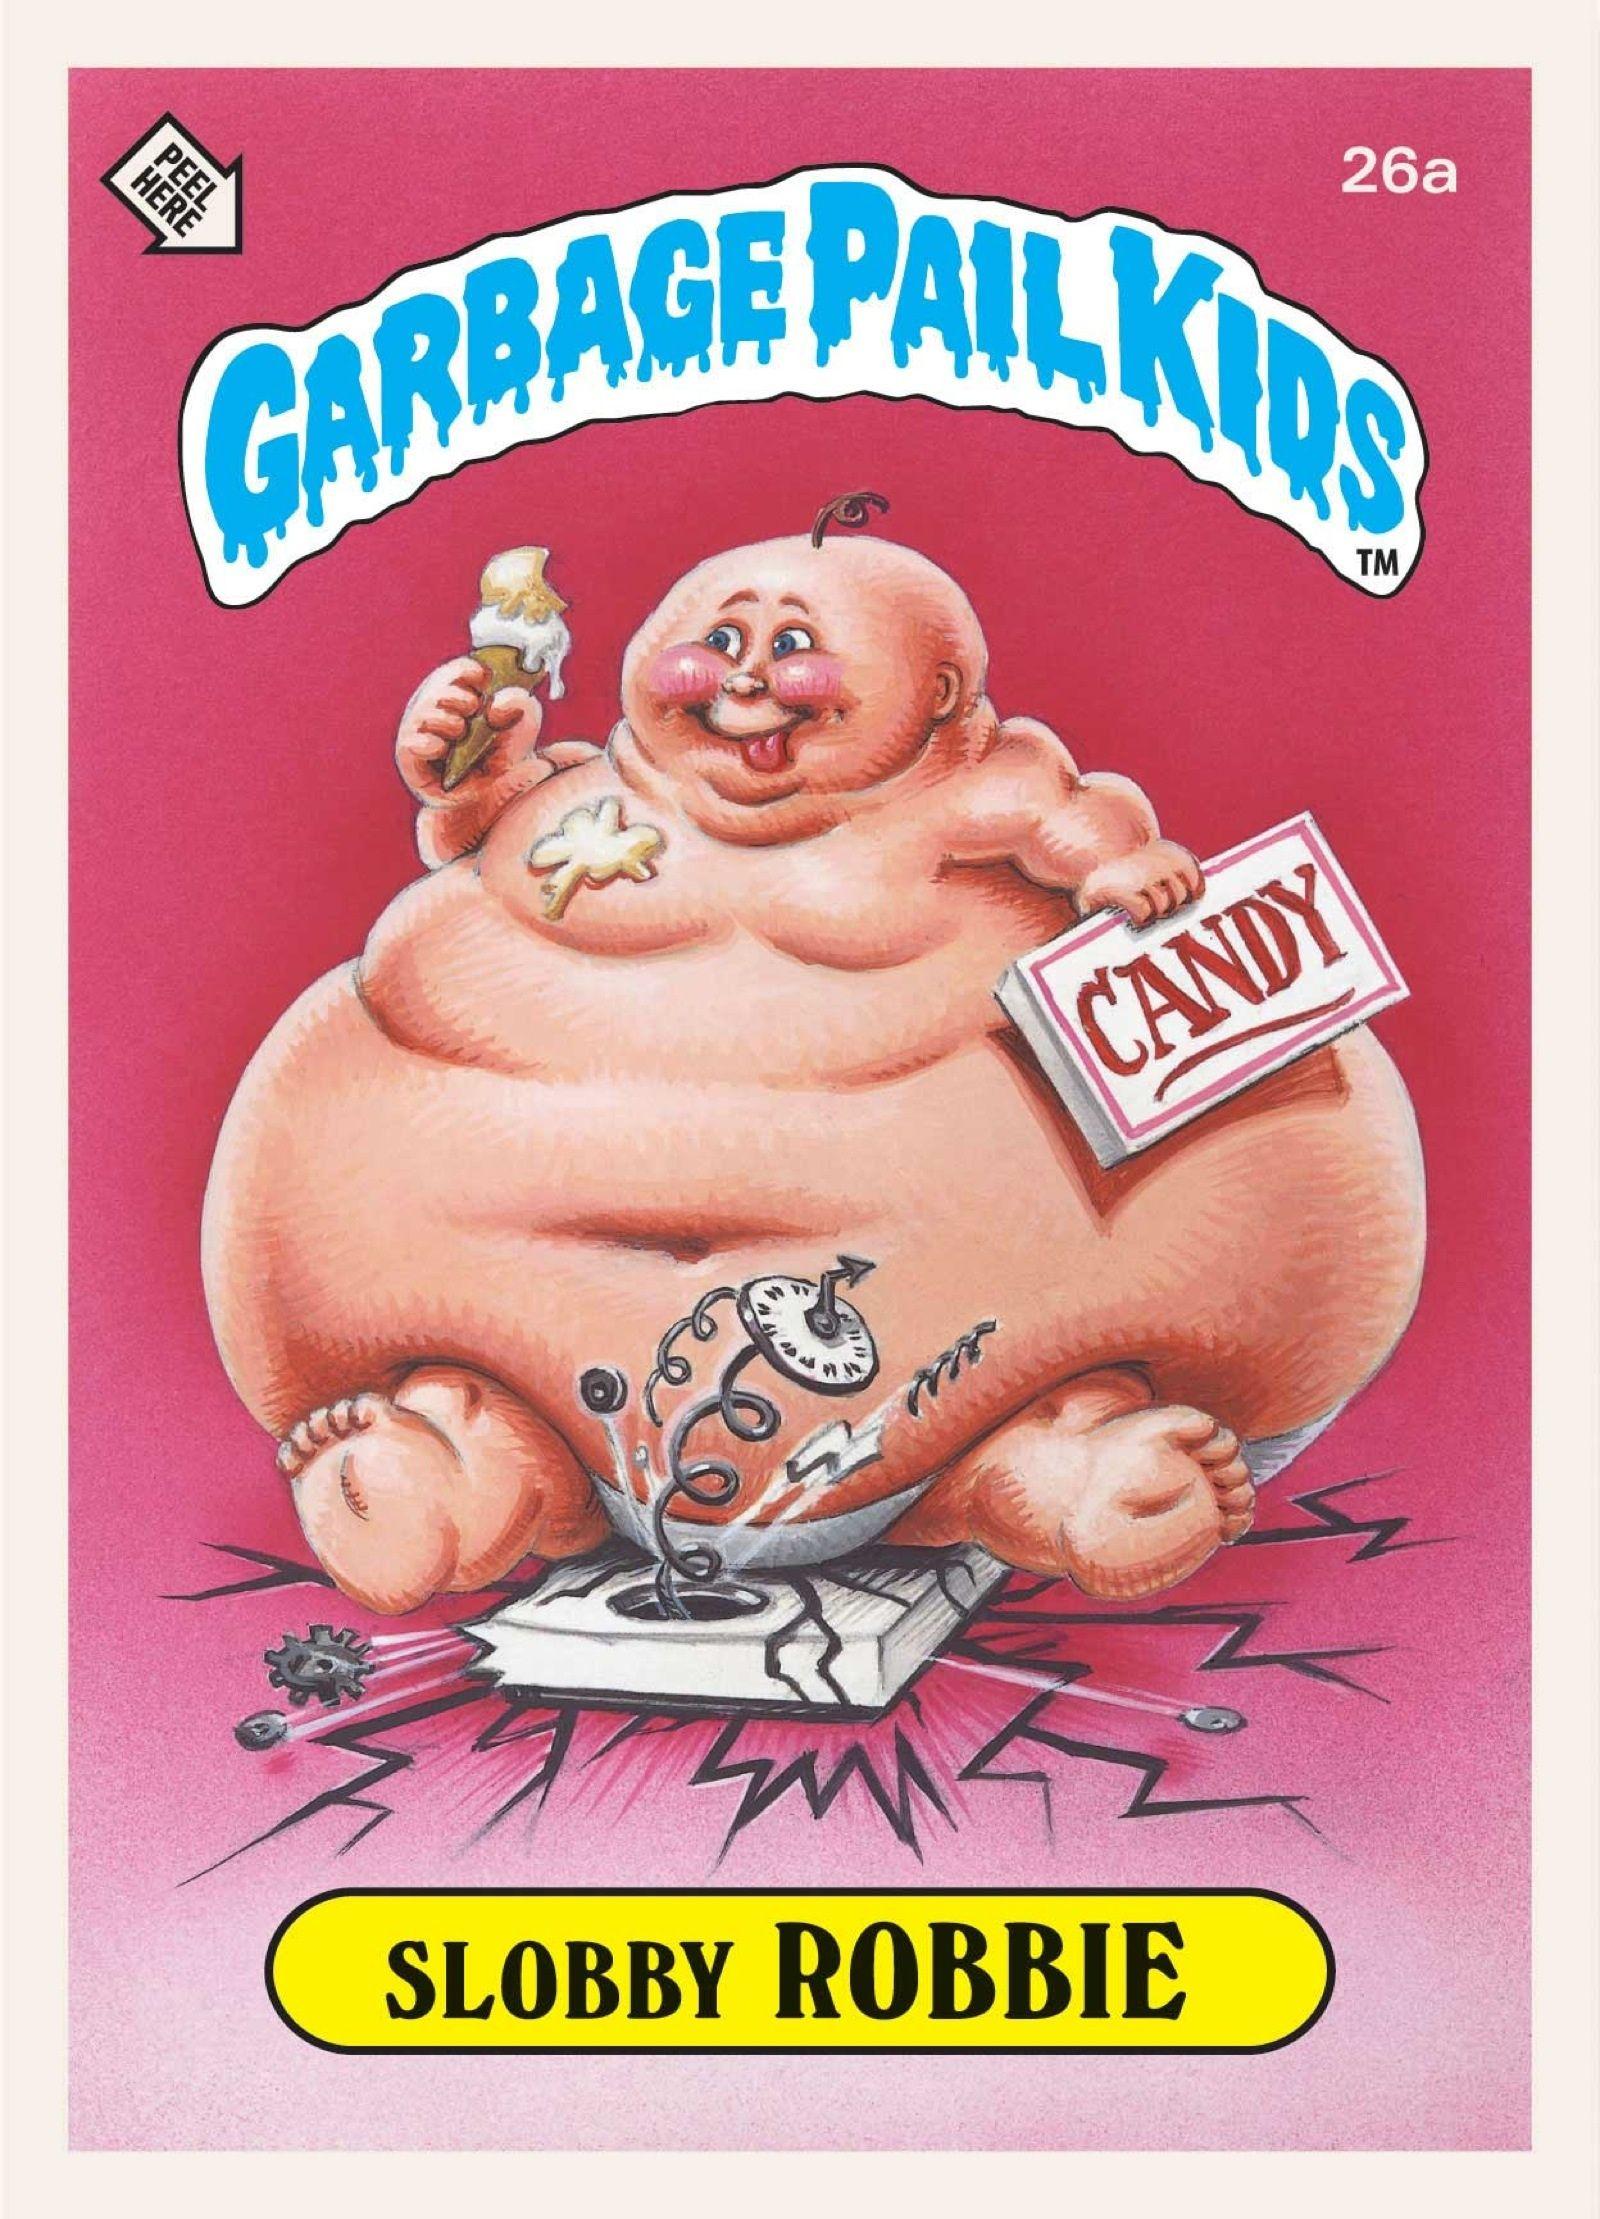 Bad Cinema The Garbage Pail Kids Movie Dir Rod Amateau 1987 Garbage Pail Kids Garbage Pail Kids Cards Kids Cards